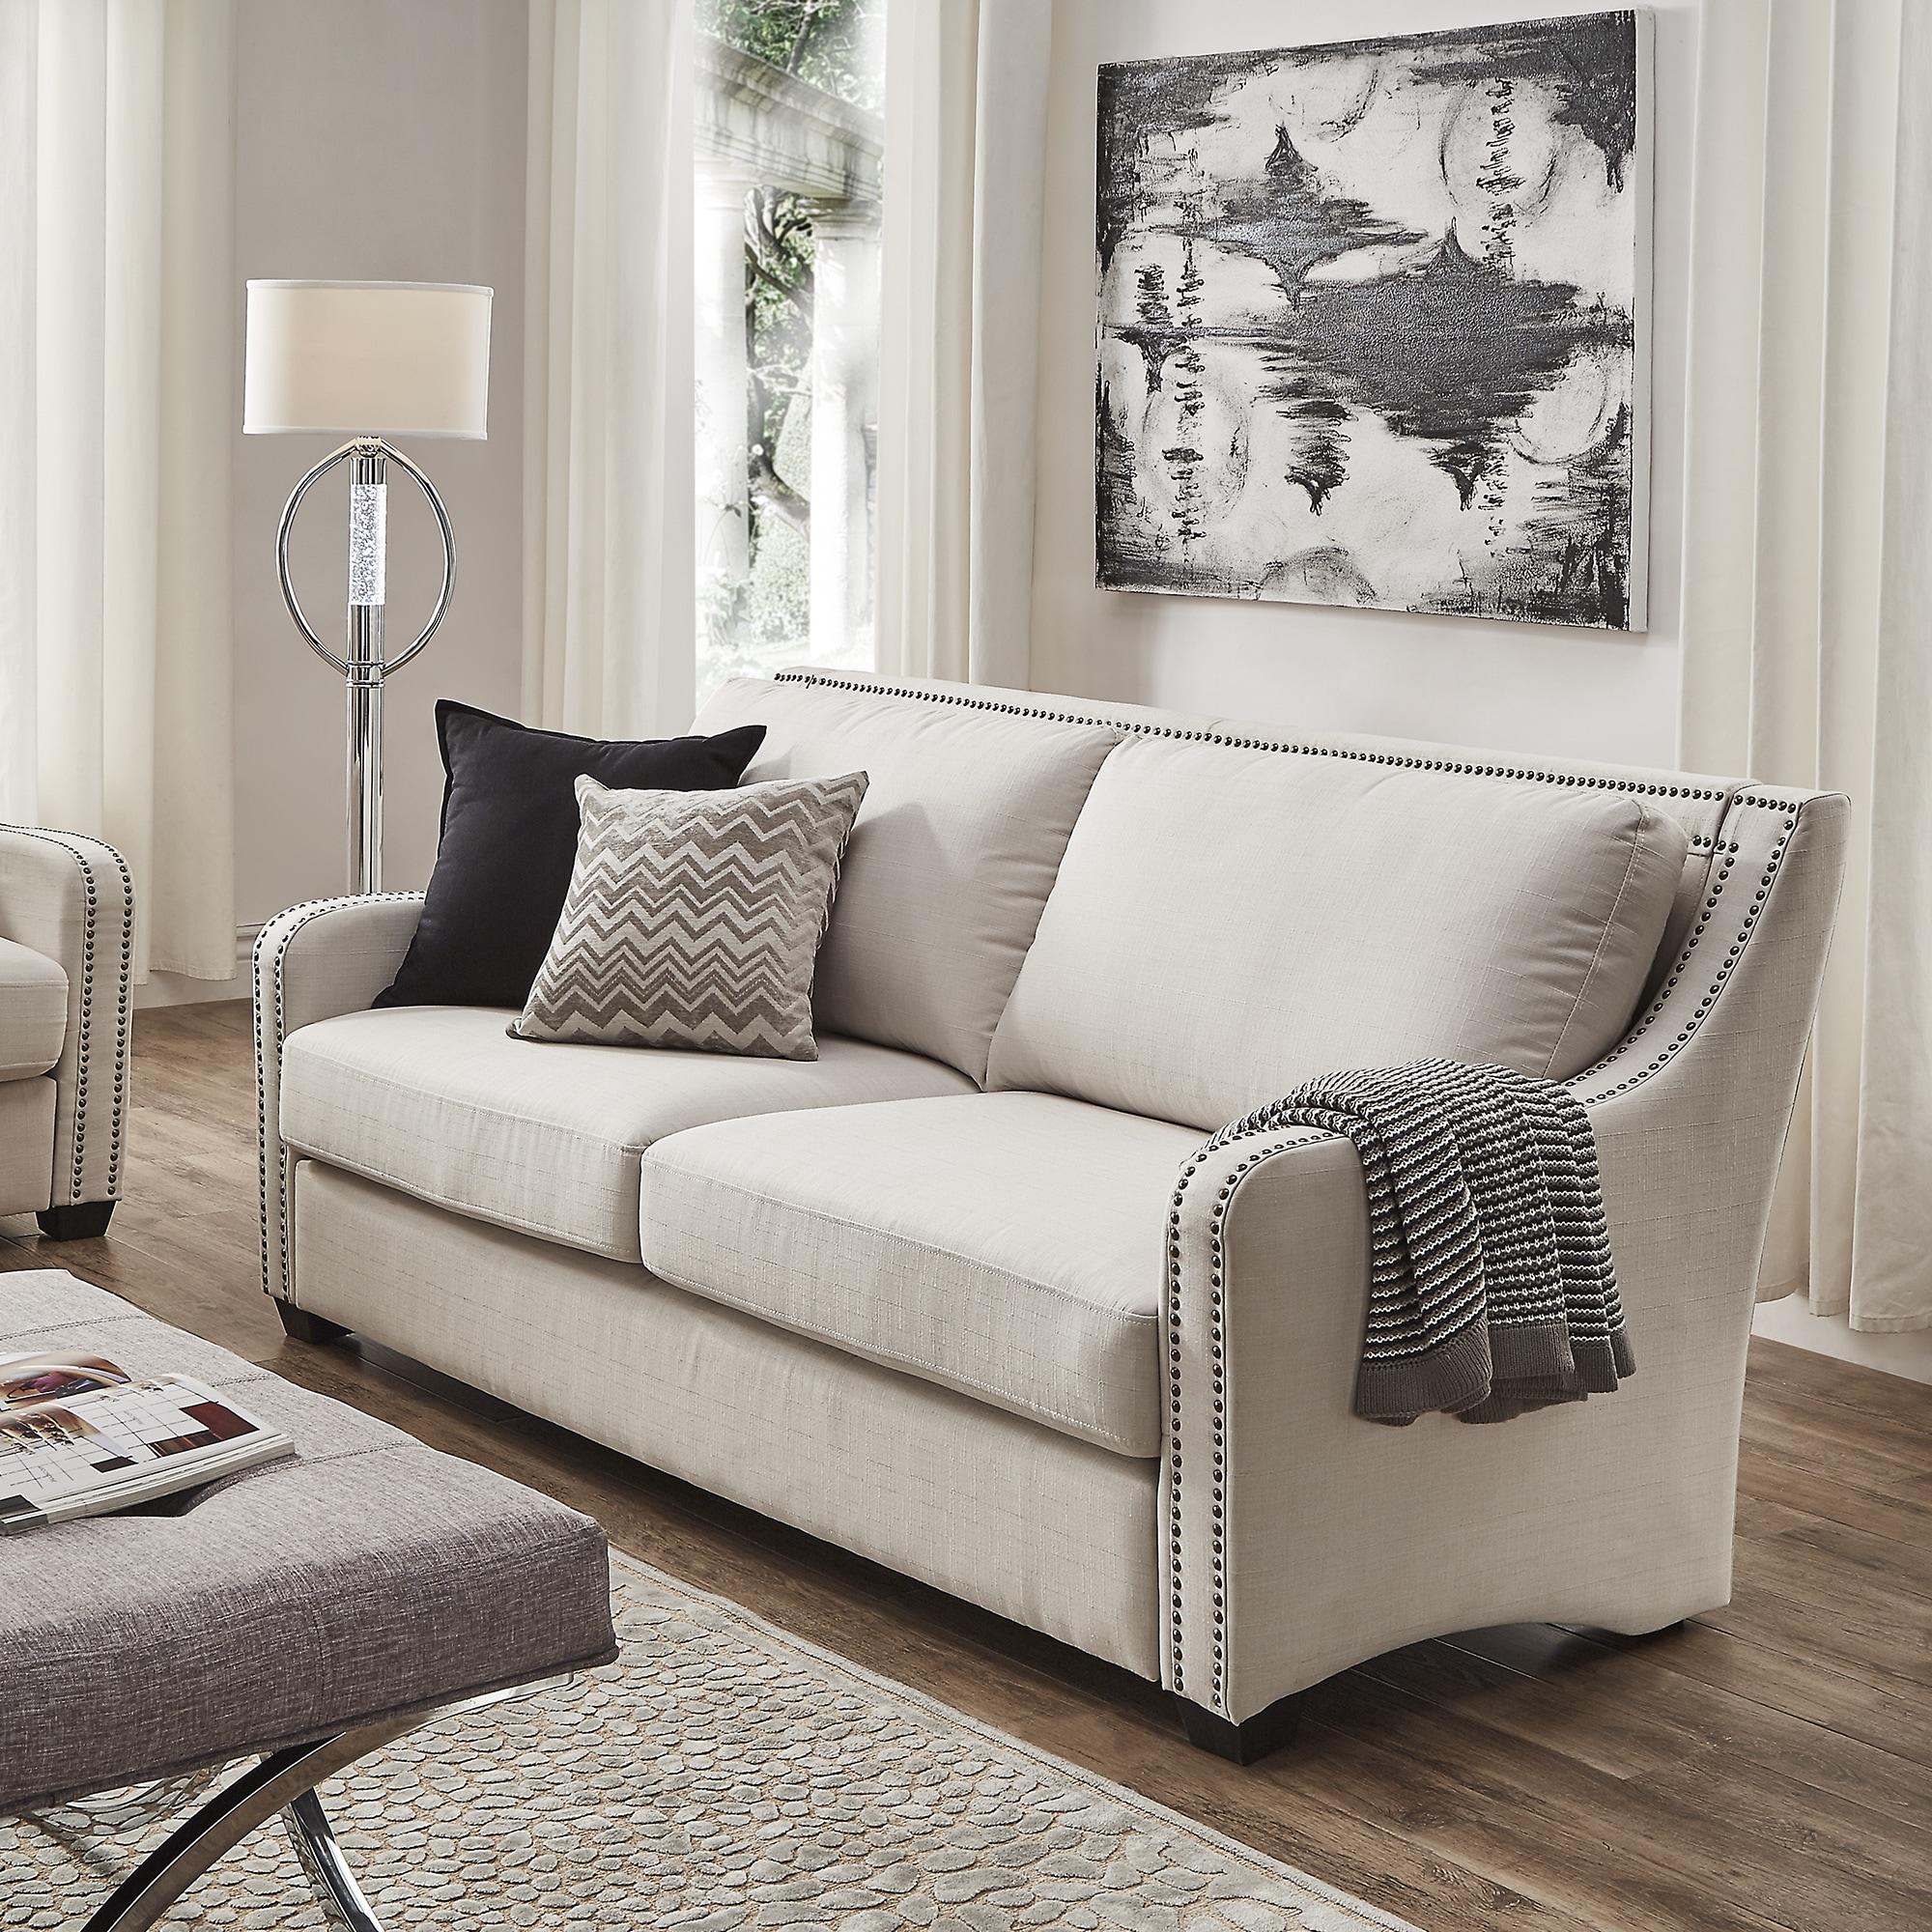 Faizah White Linen Nailhead Sloped Arm Sofa By INSPIRE Q Artisan   Free  Shipping Today   Overstock   20662669